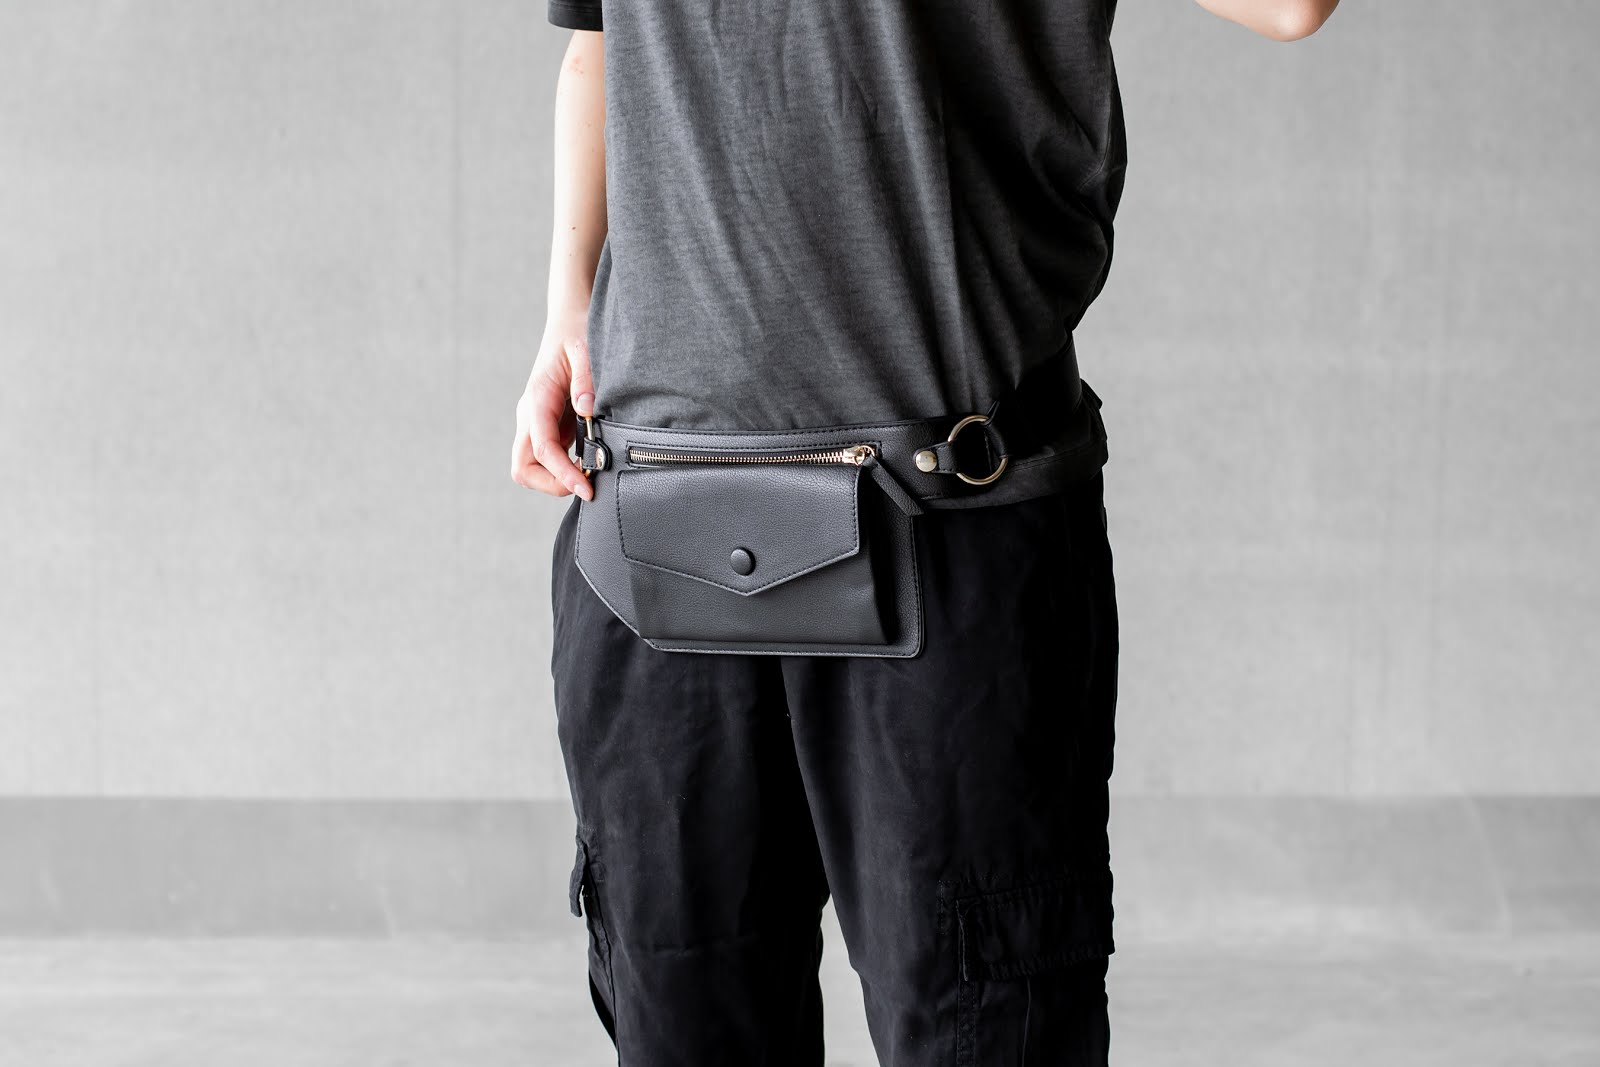 s.Oliver, belt bag, bum bag, minimal outfit, black, dad sneakers, street style, 2019, trends